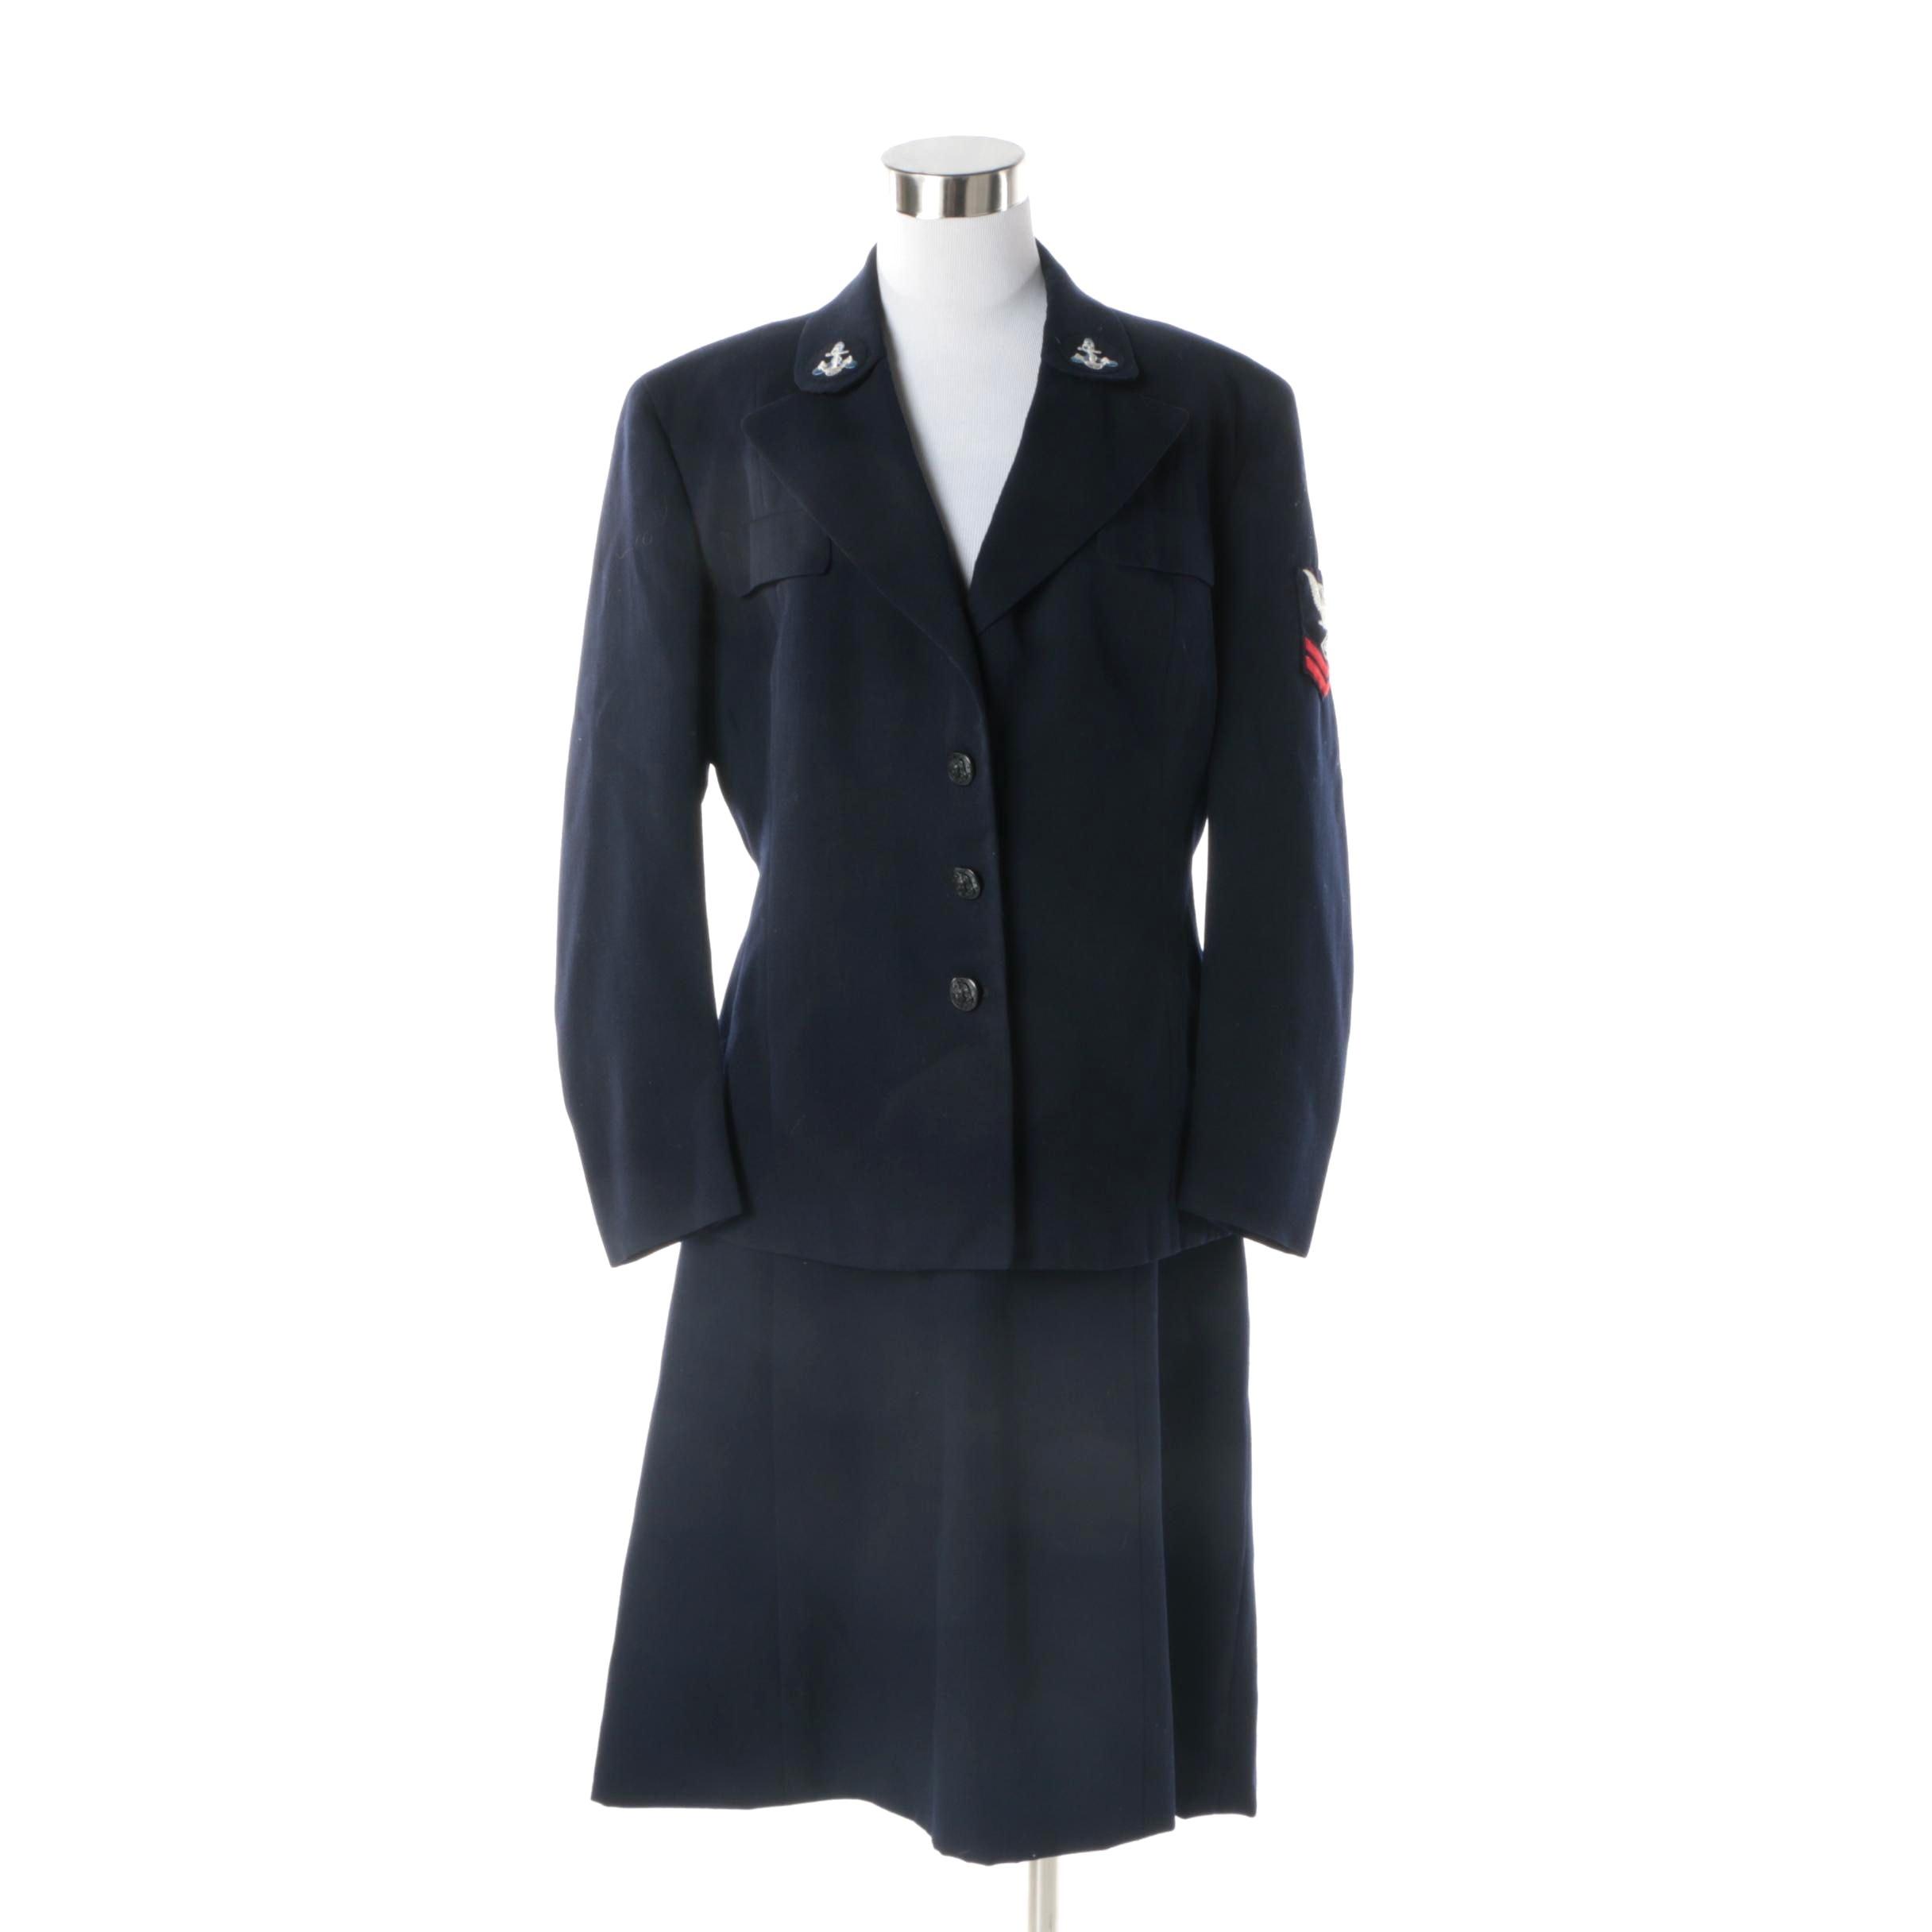 Women's 1940s Vintage WWII Era US Navy Wool Blend Skirt Suit